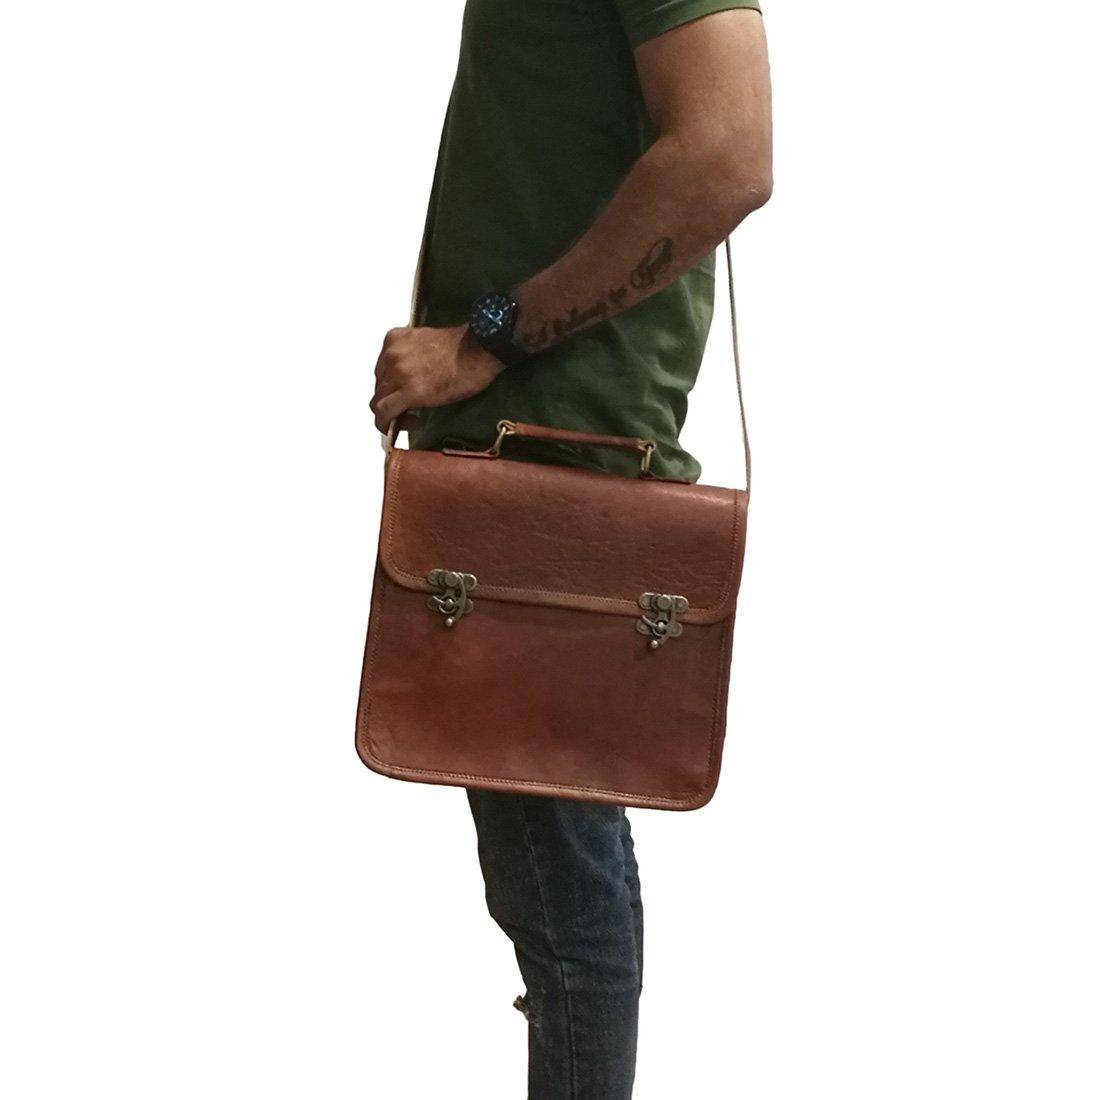 Mad Over Shopping Indian Brown Messenger Genuine Leather Mens Shoulder Bag Crossbody Satchel Clasp Lock